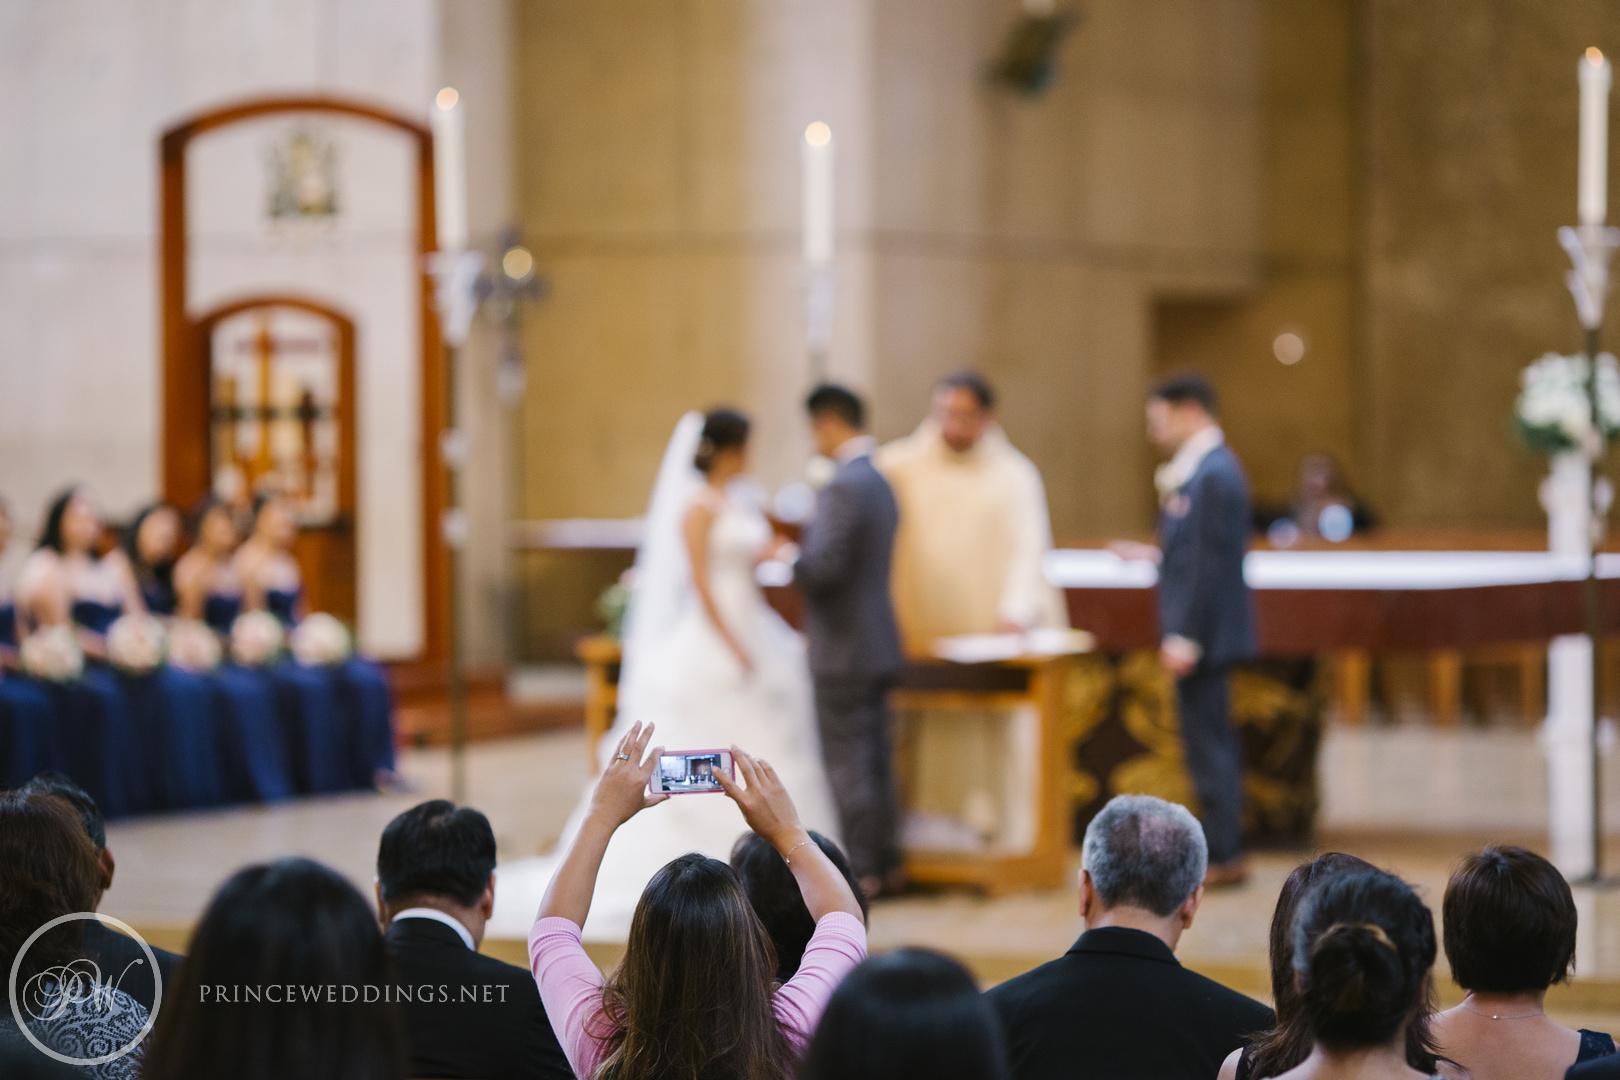 CathedralOf OurLadyOfAngels_OdysseyRestaurantWeddingPhoto_SiriIsmael088.jpg